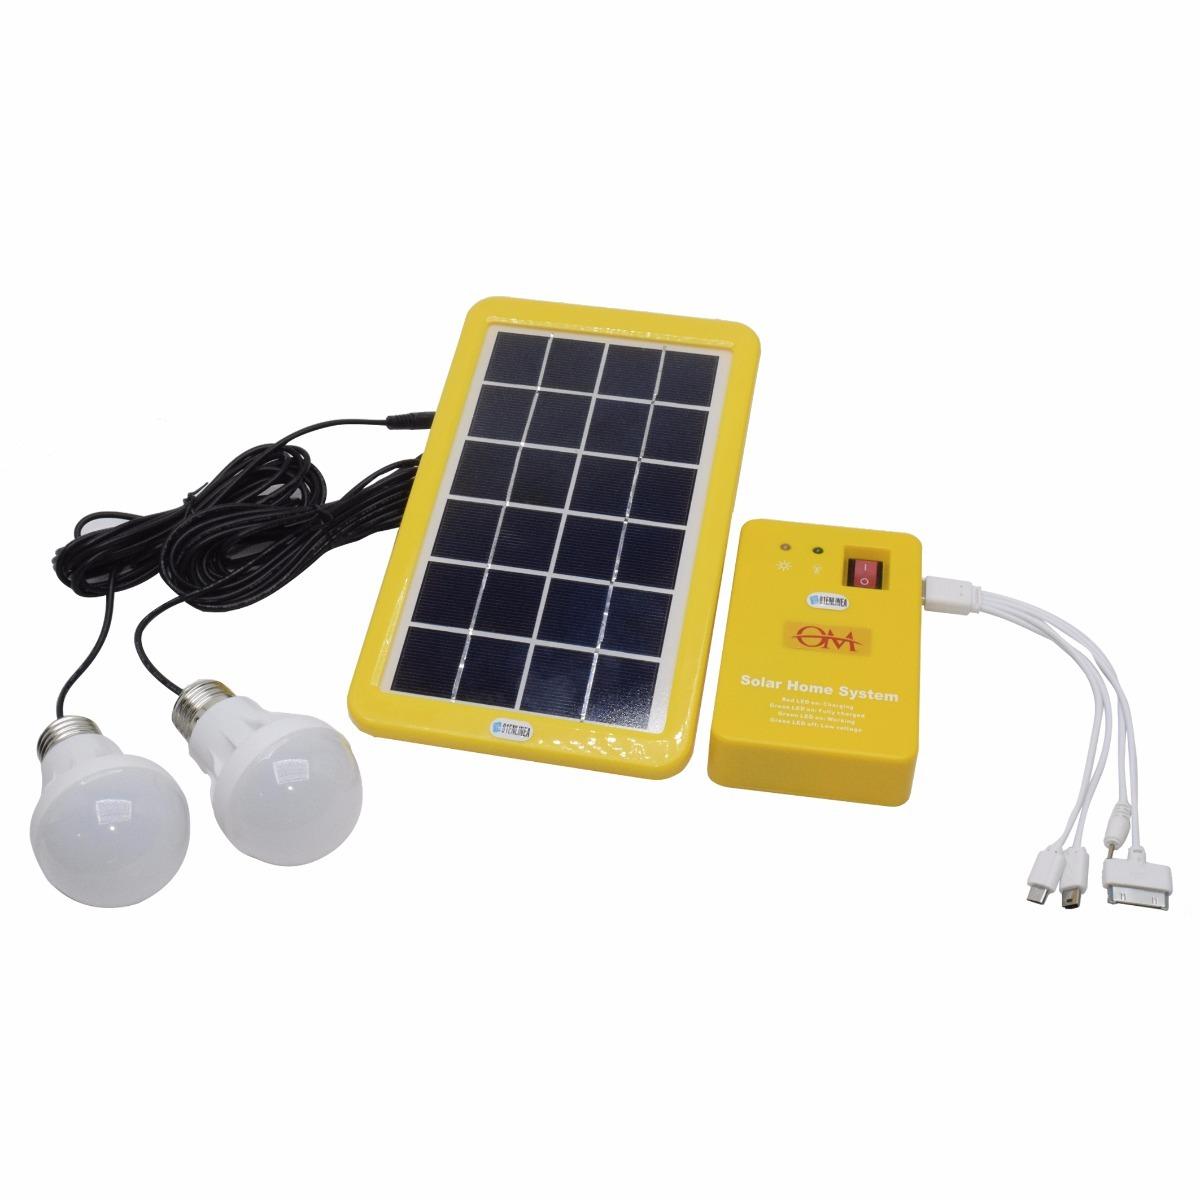 8f235940fa4a1 kit panel solar portatil 3w + 2 lamparas led cargador usb. Cargando zoom.